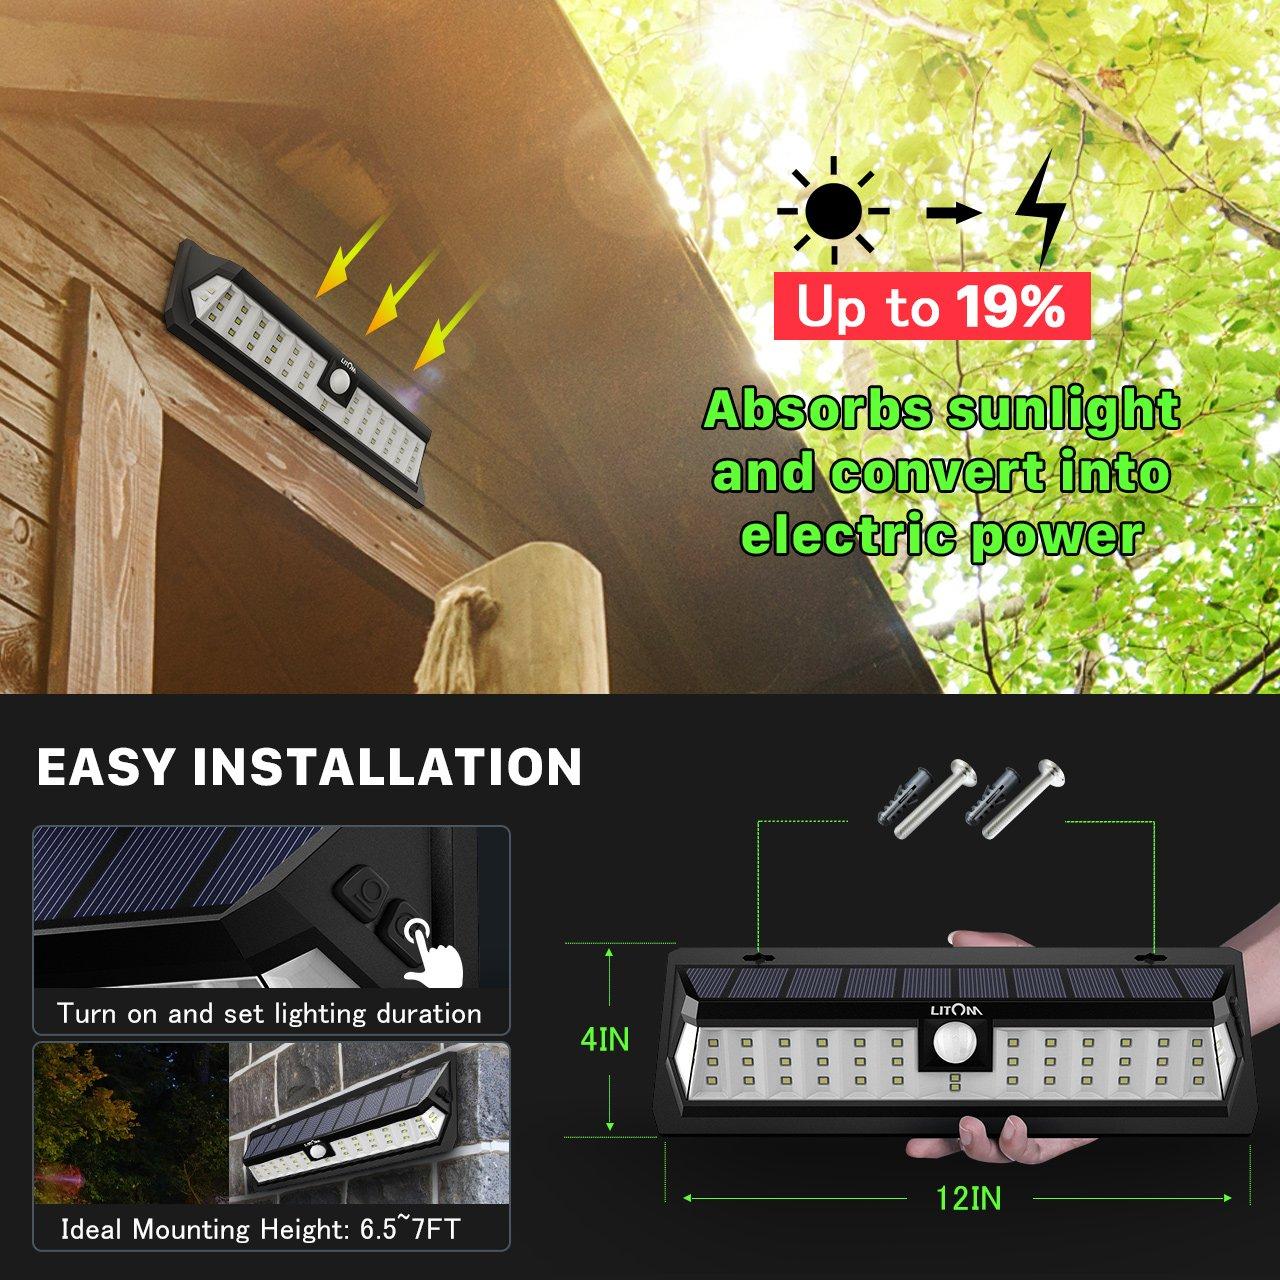 LITOM Solar Lights Outdoor 42 LED, Adjustable Lighting Time Solar Motion Sensor Light with 270° Wide Angle and Waterproof Design, Wireless Solar Lighting for Front Door, Yard, Garage, Deck (2 Pack) by Litom (Image #5)